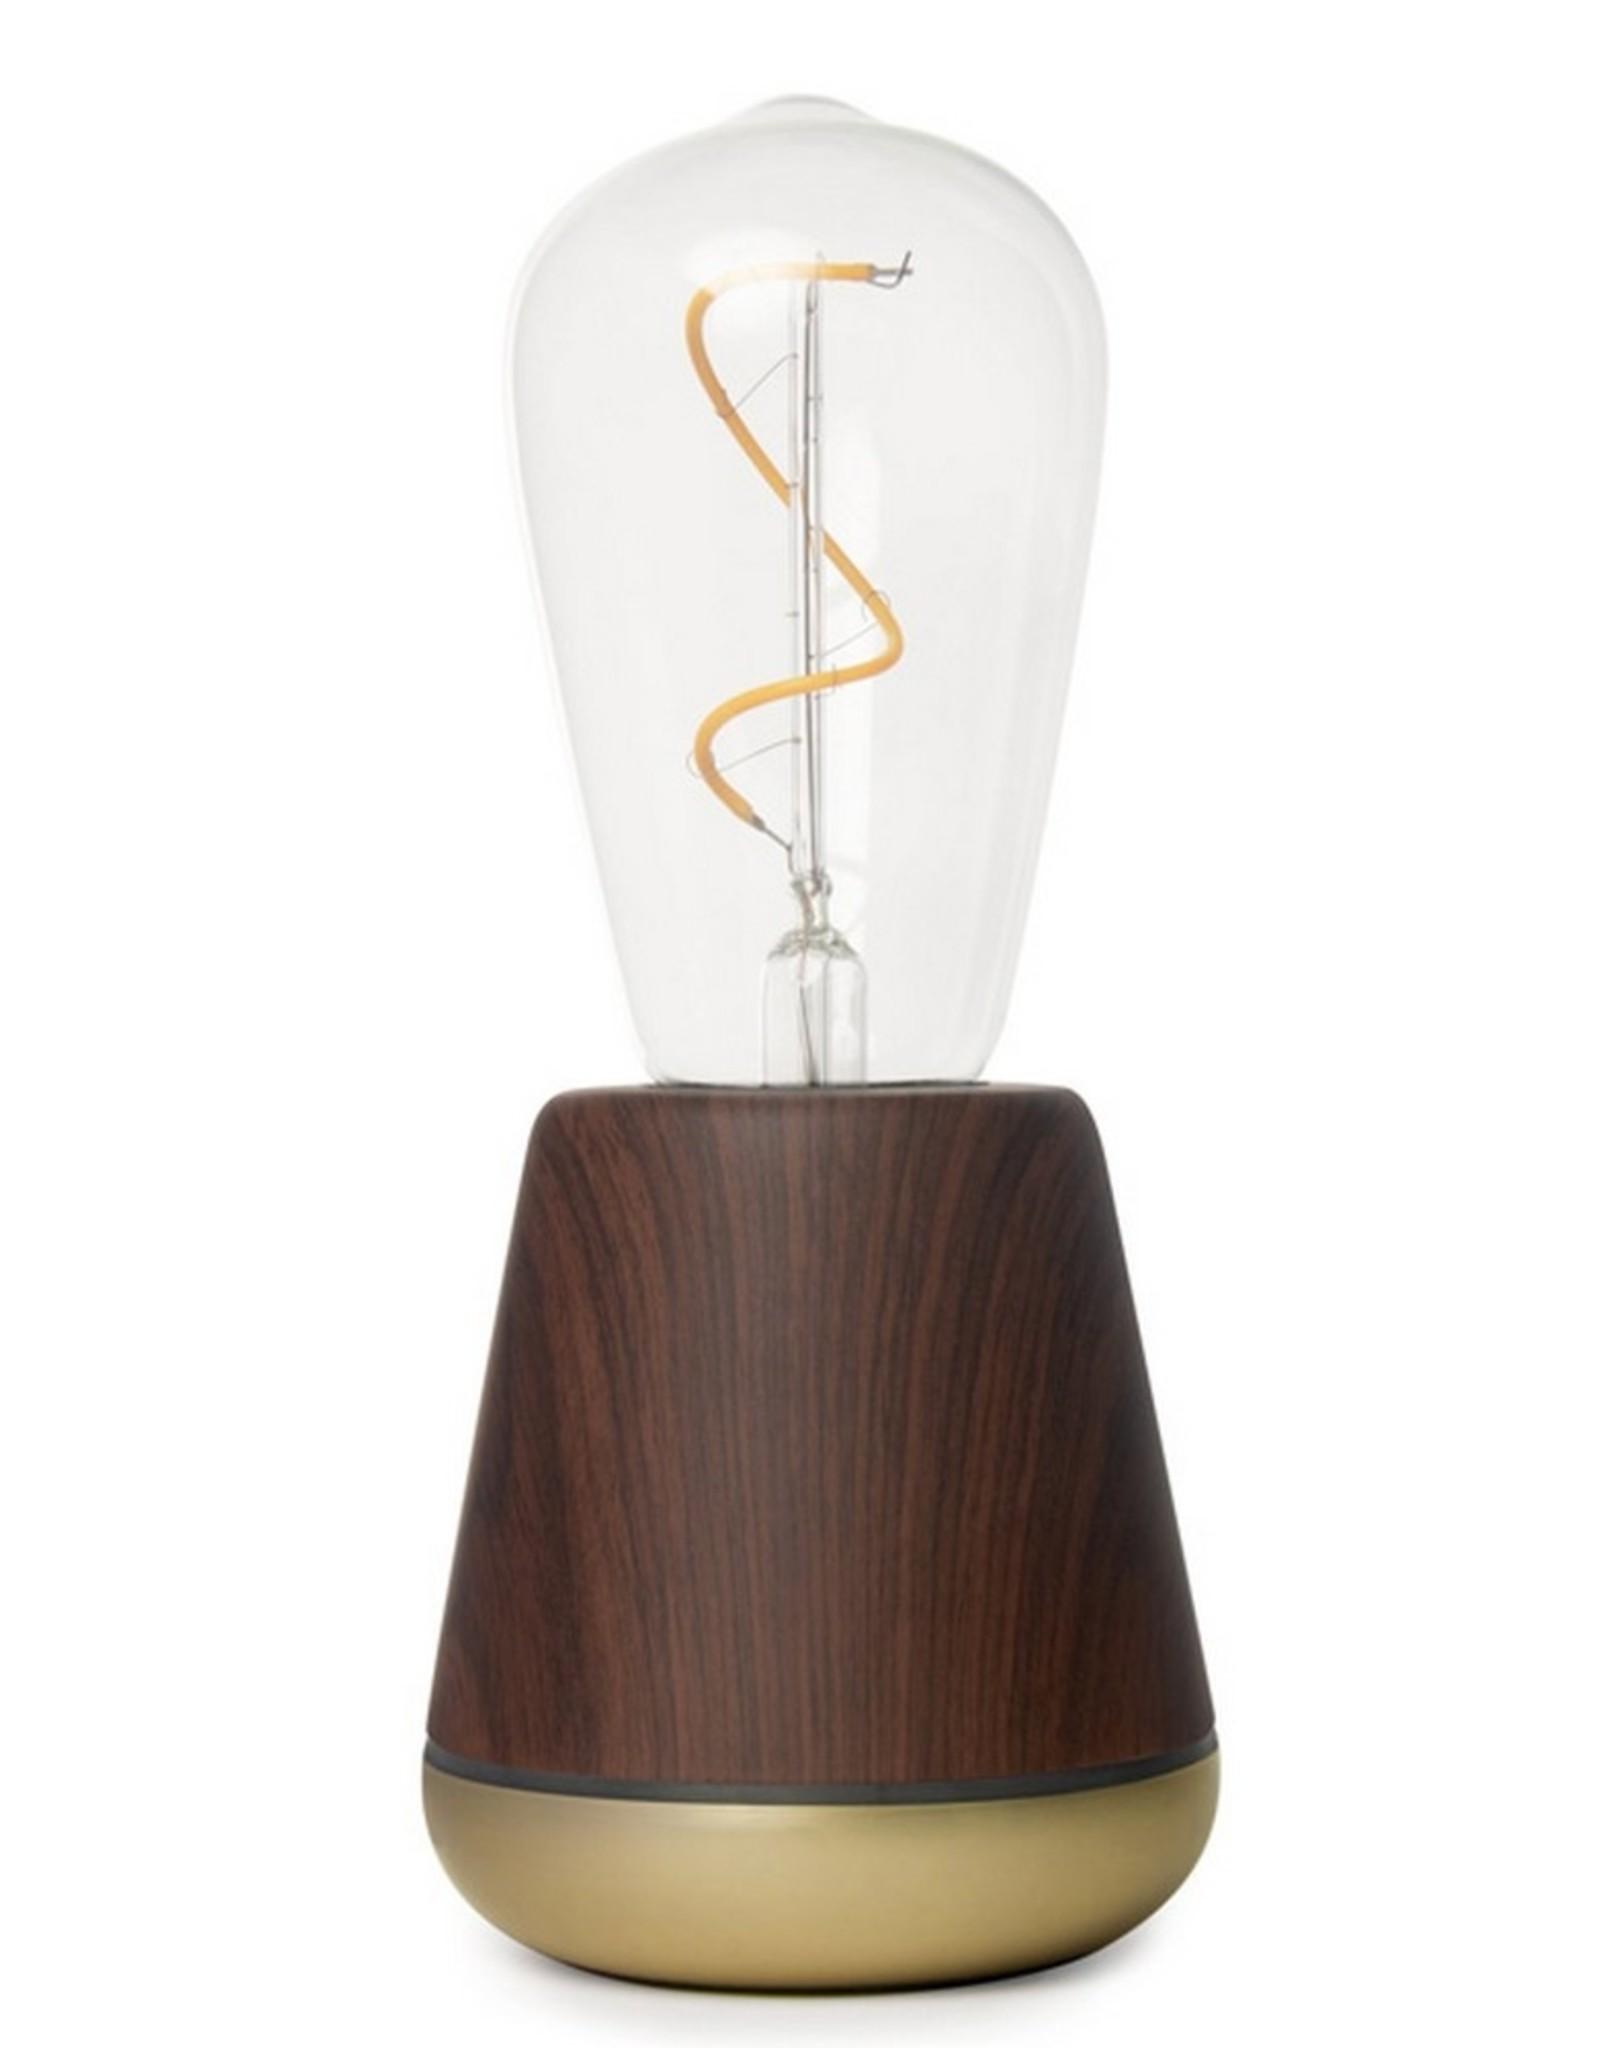 Humble Humble One Tafellamp Walnut